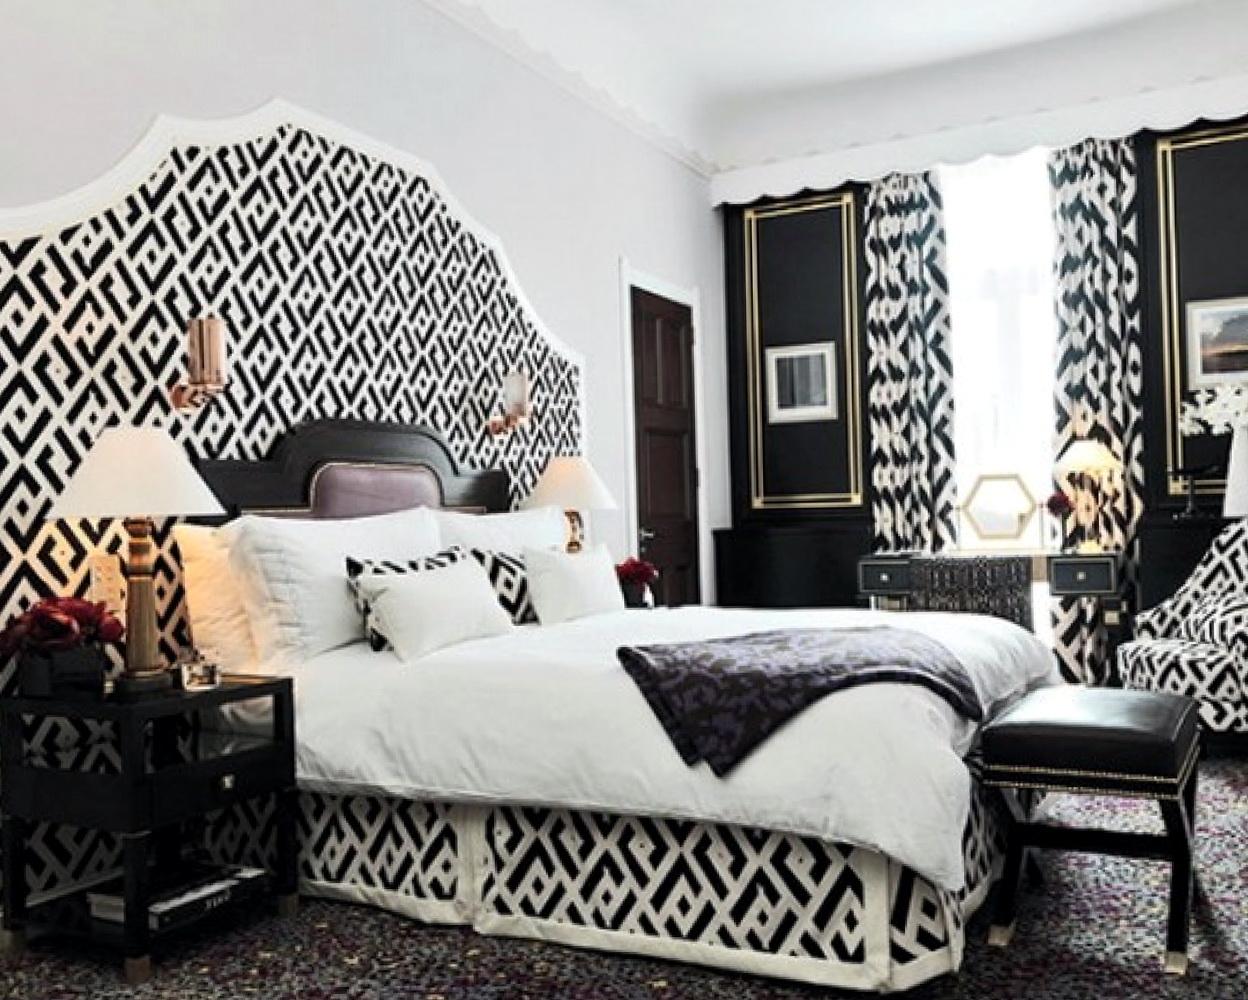 Paris Bedroom Decor Black And White